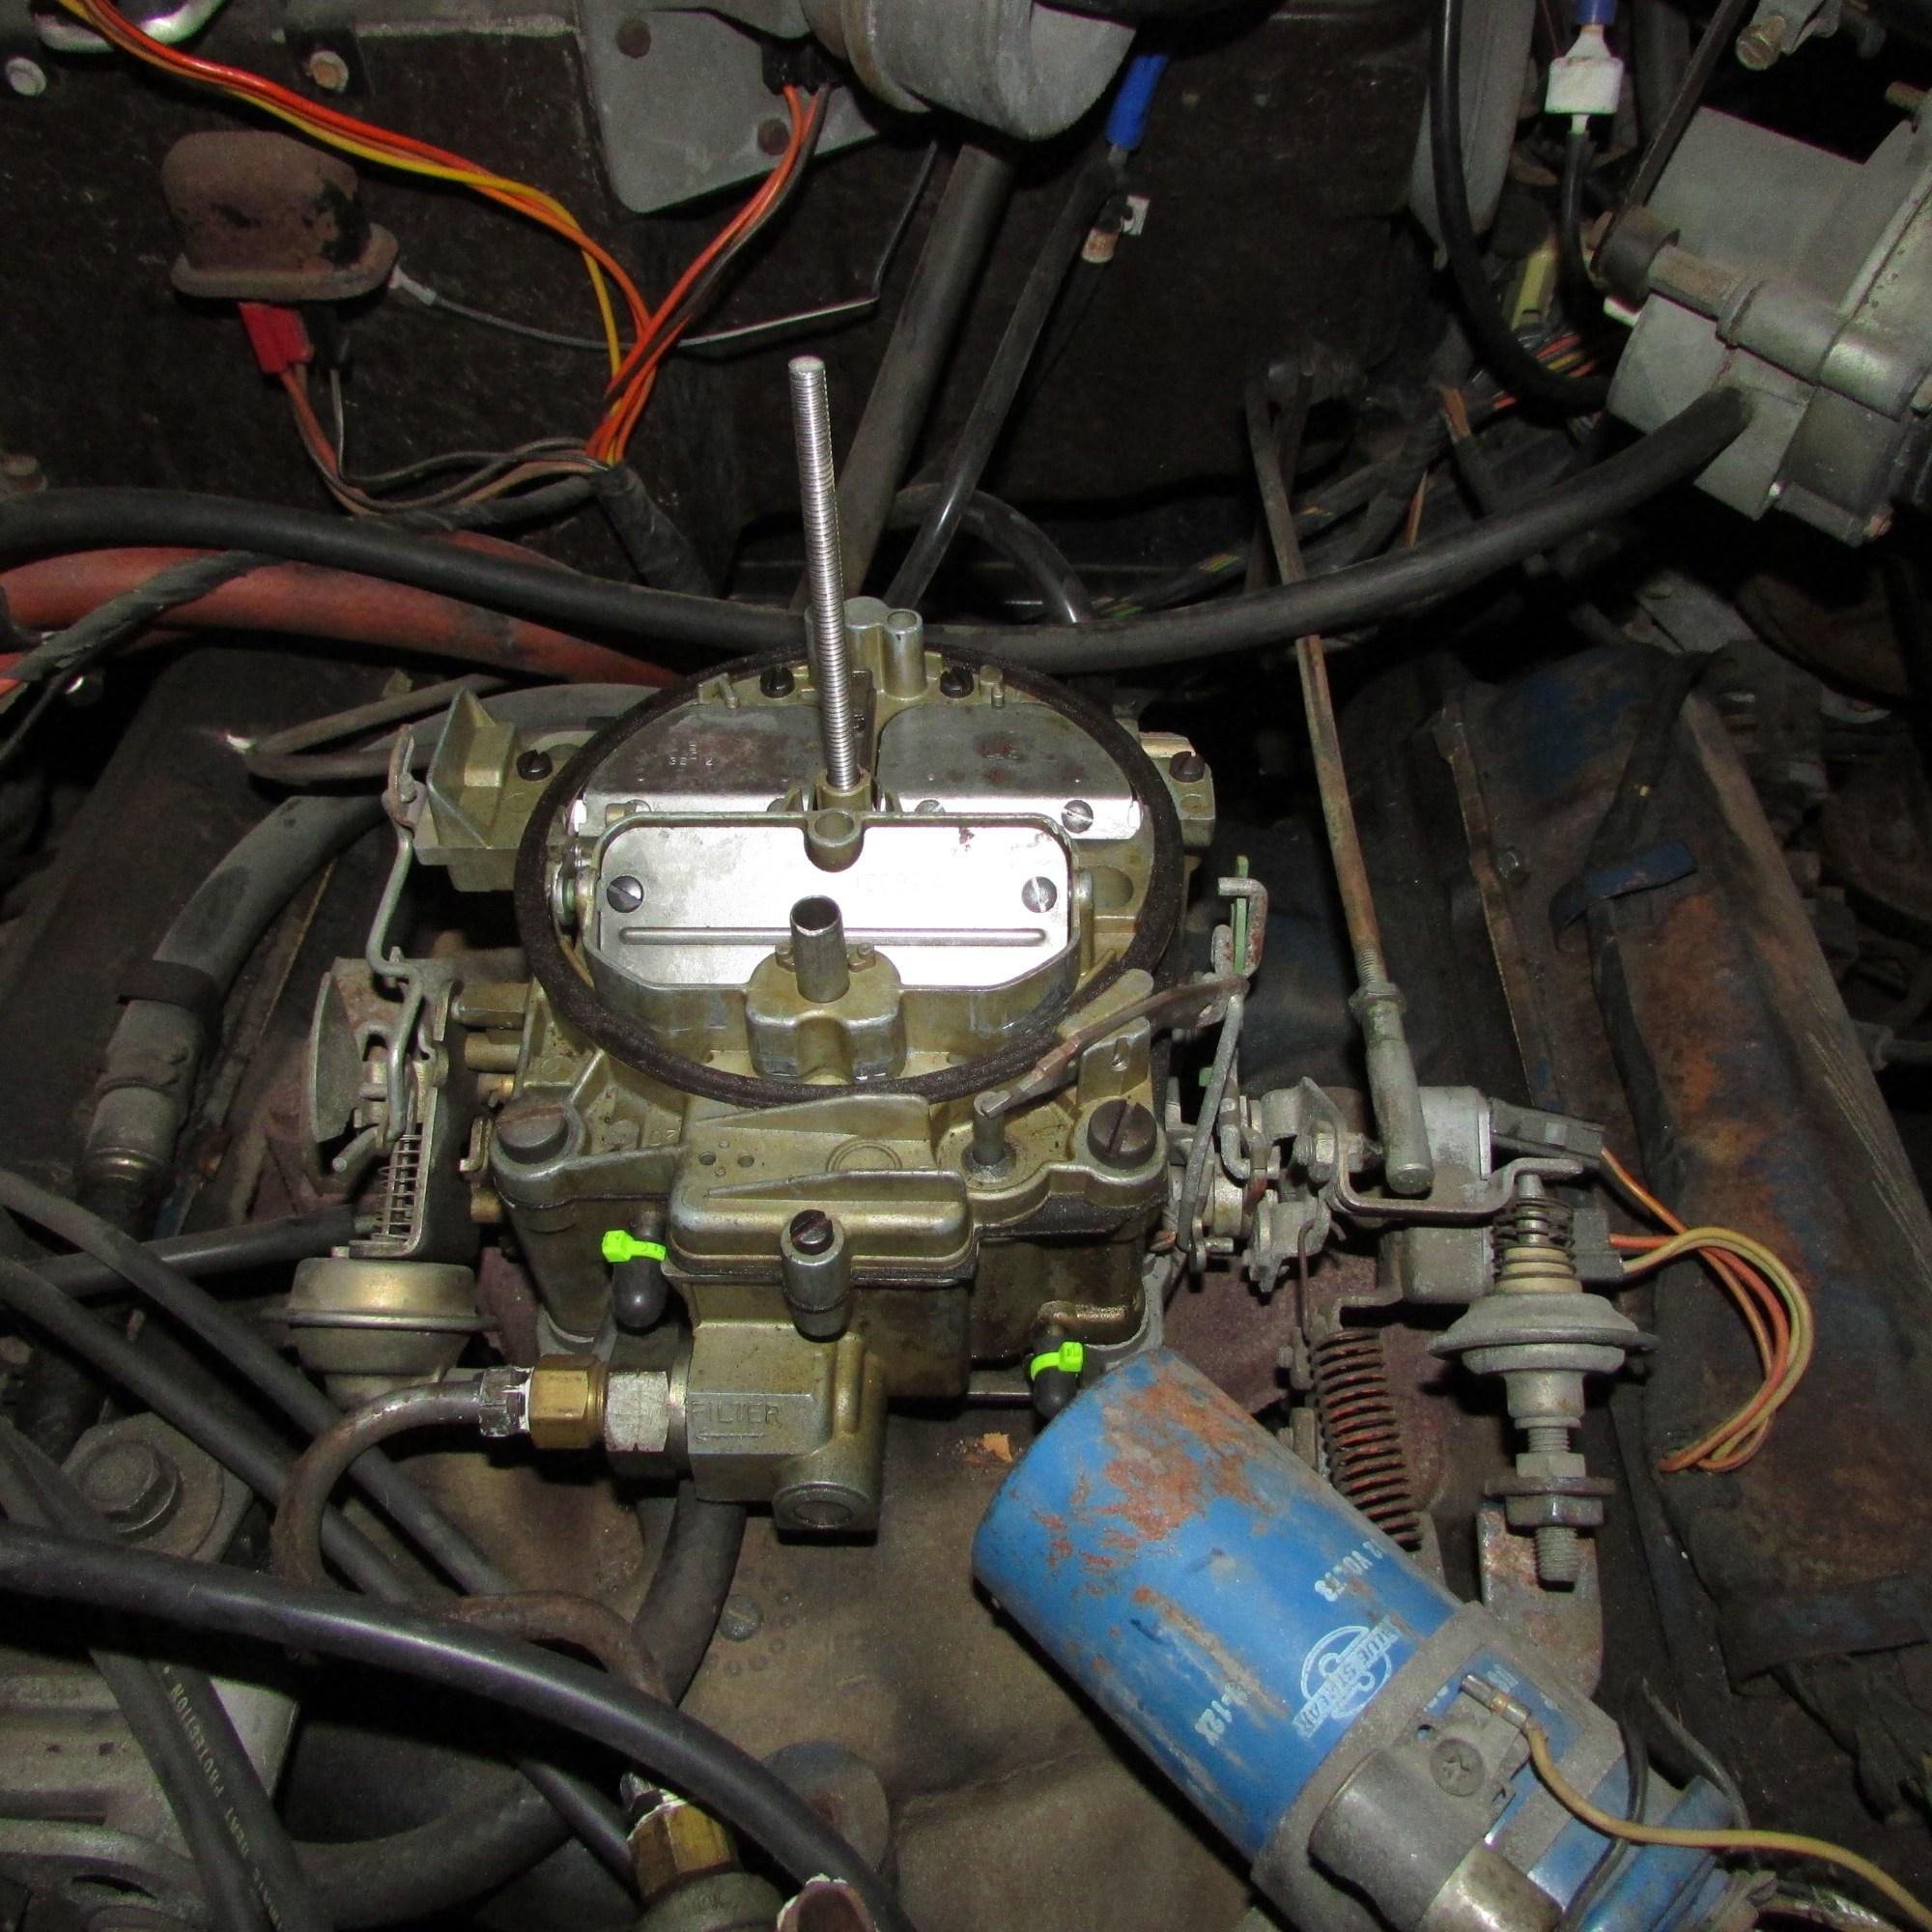 hight resolution of 1970 cadillac deville 472 engine vacuum diagram north star 4 6l engine diagram elsavadorla automatic transmission